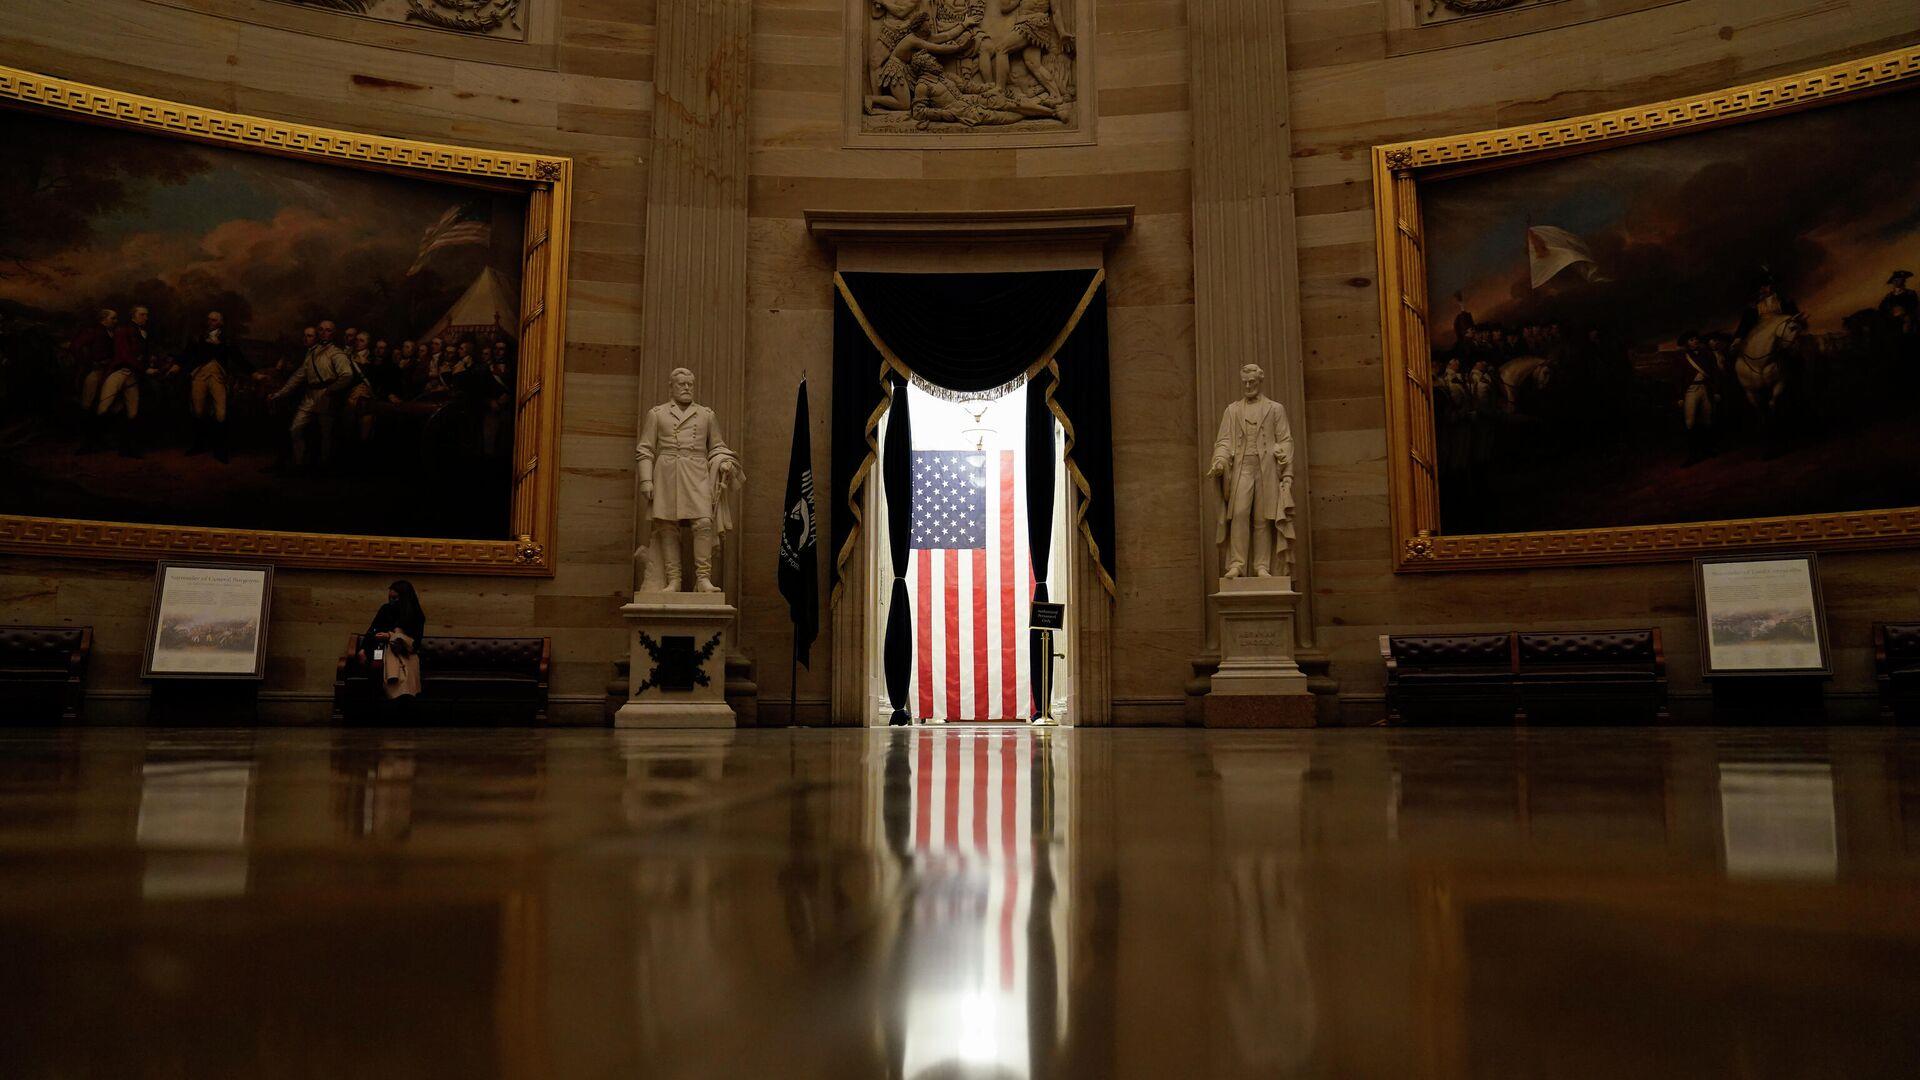 Американский флаг в здании Капитолия в Вашингтоне - РИА Новости, 1920, 09.02.2021